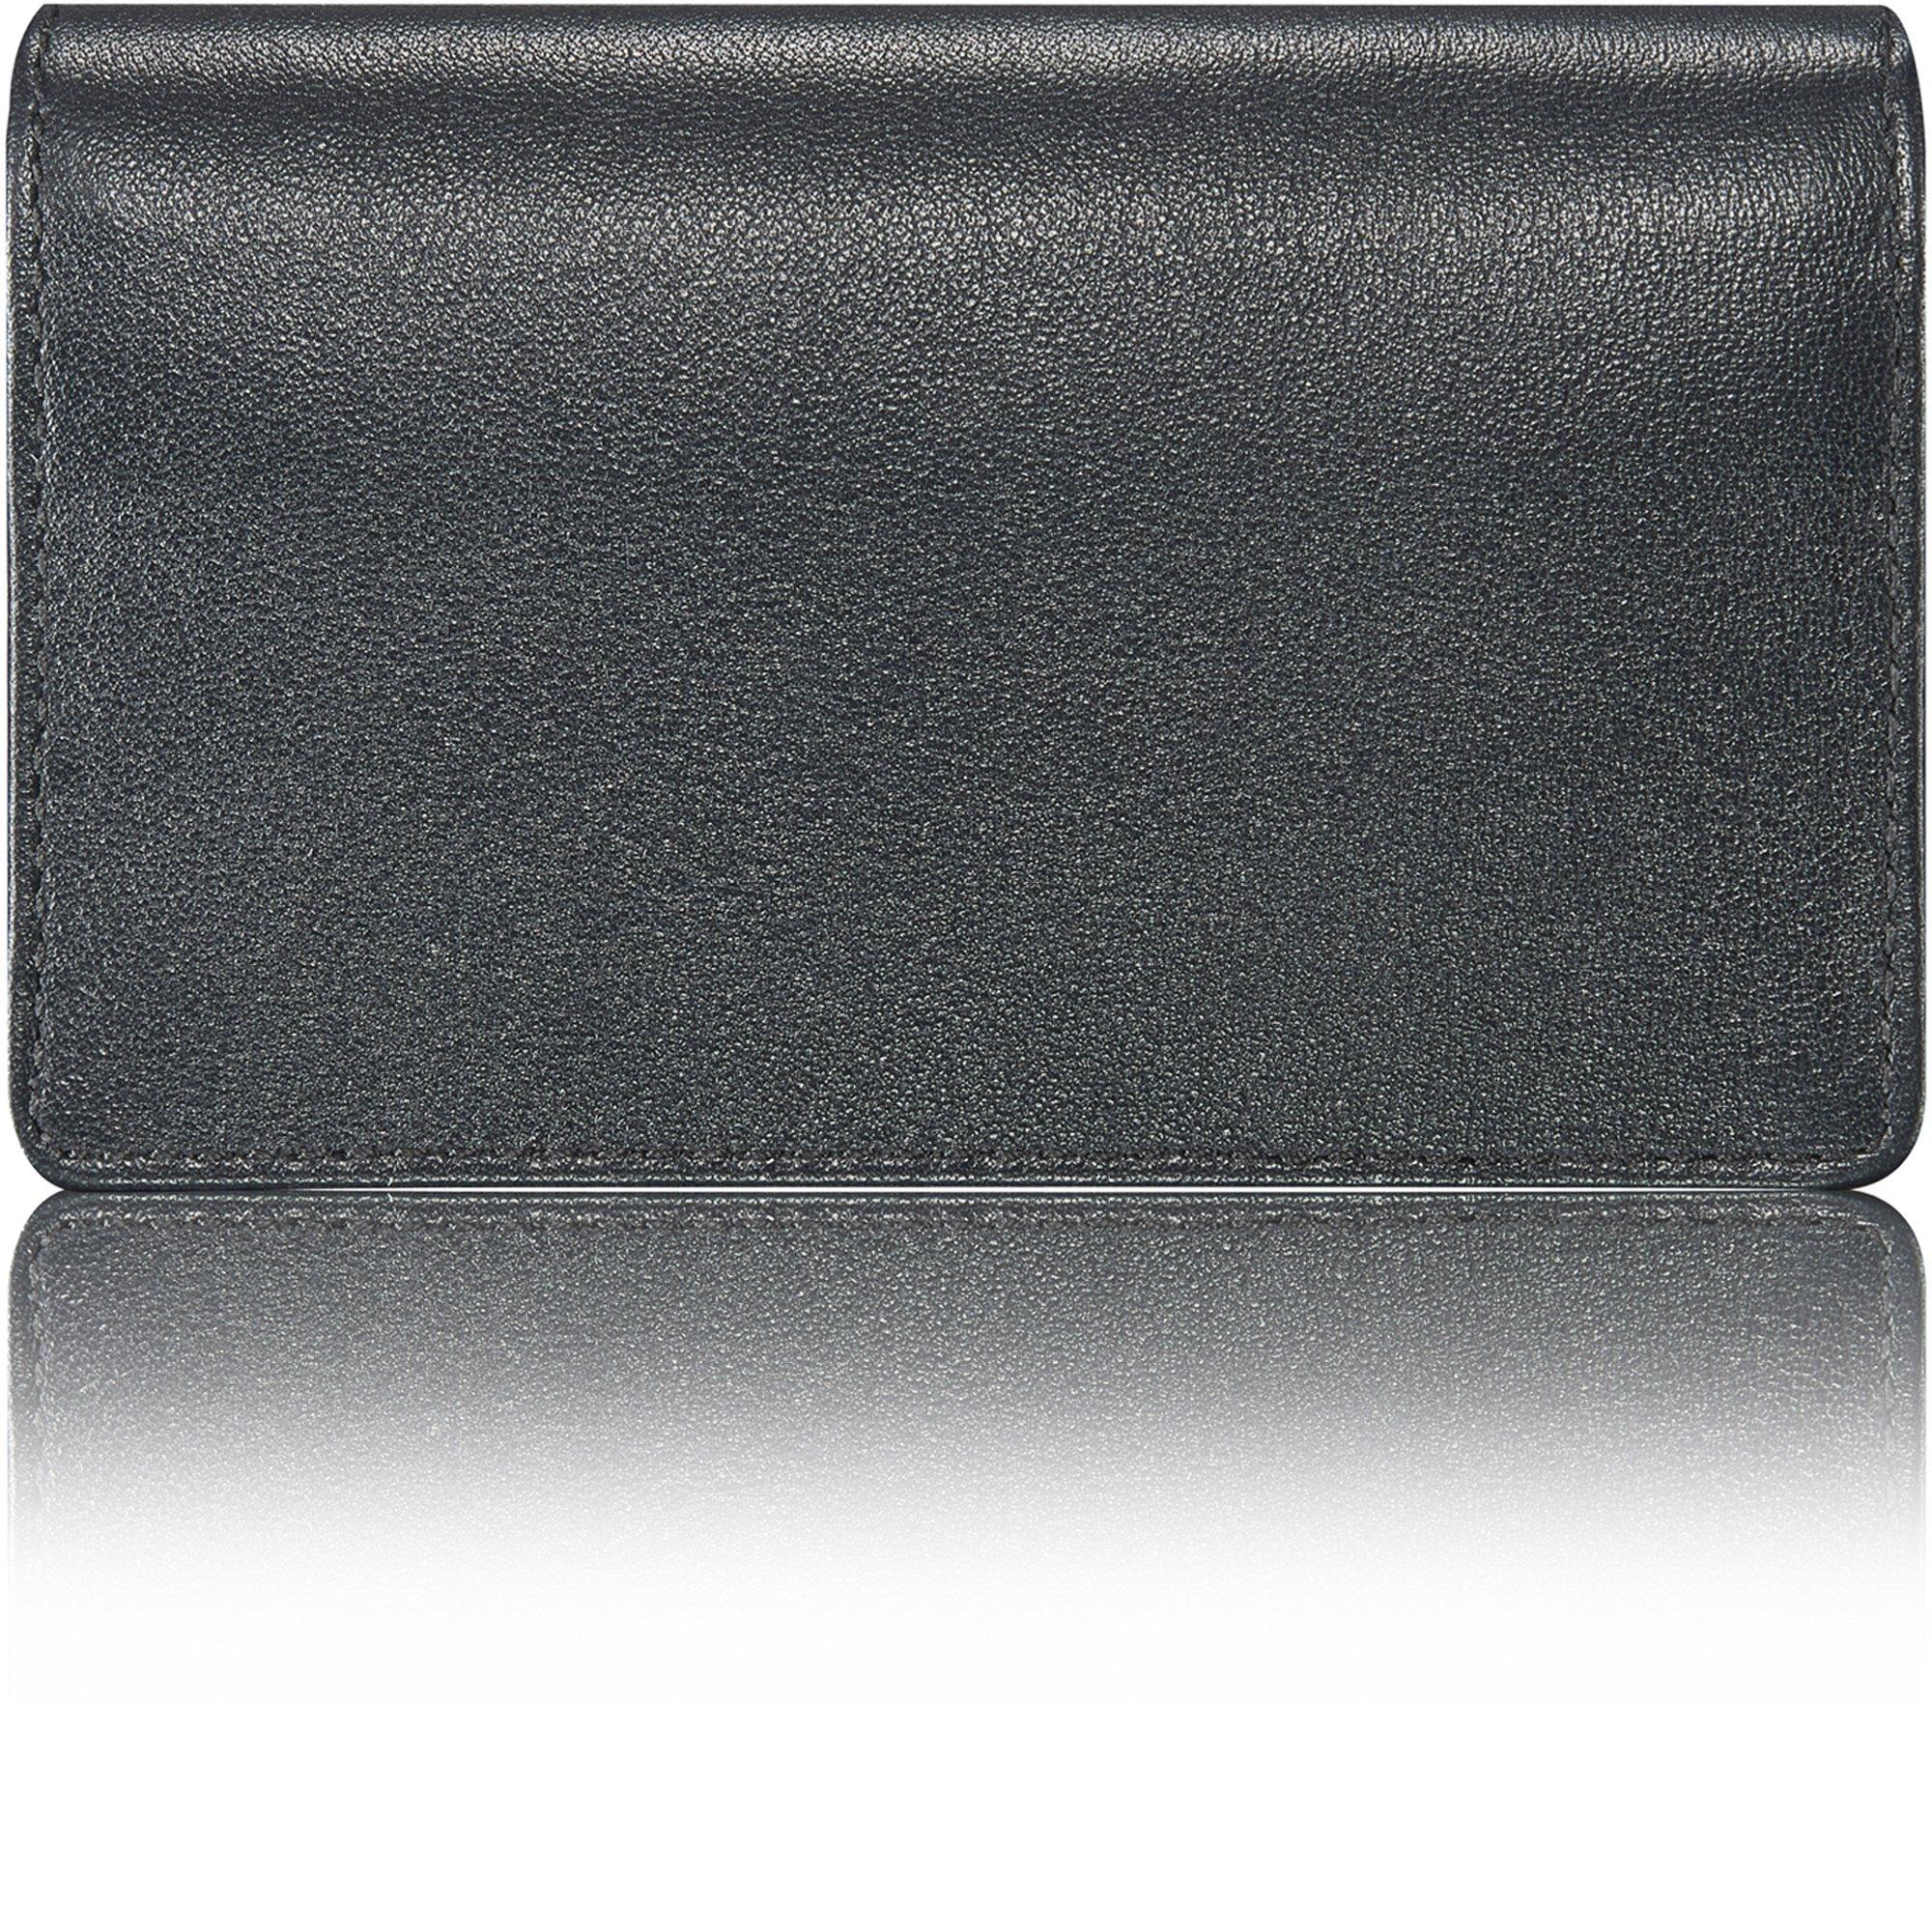 KAVAJ Leather Business Card Holder Case Wallet ''Singapore'' black - Genuine Leather by KAVAJ (Image #10)